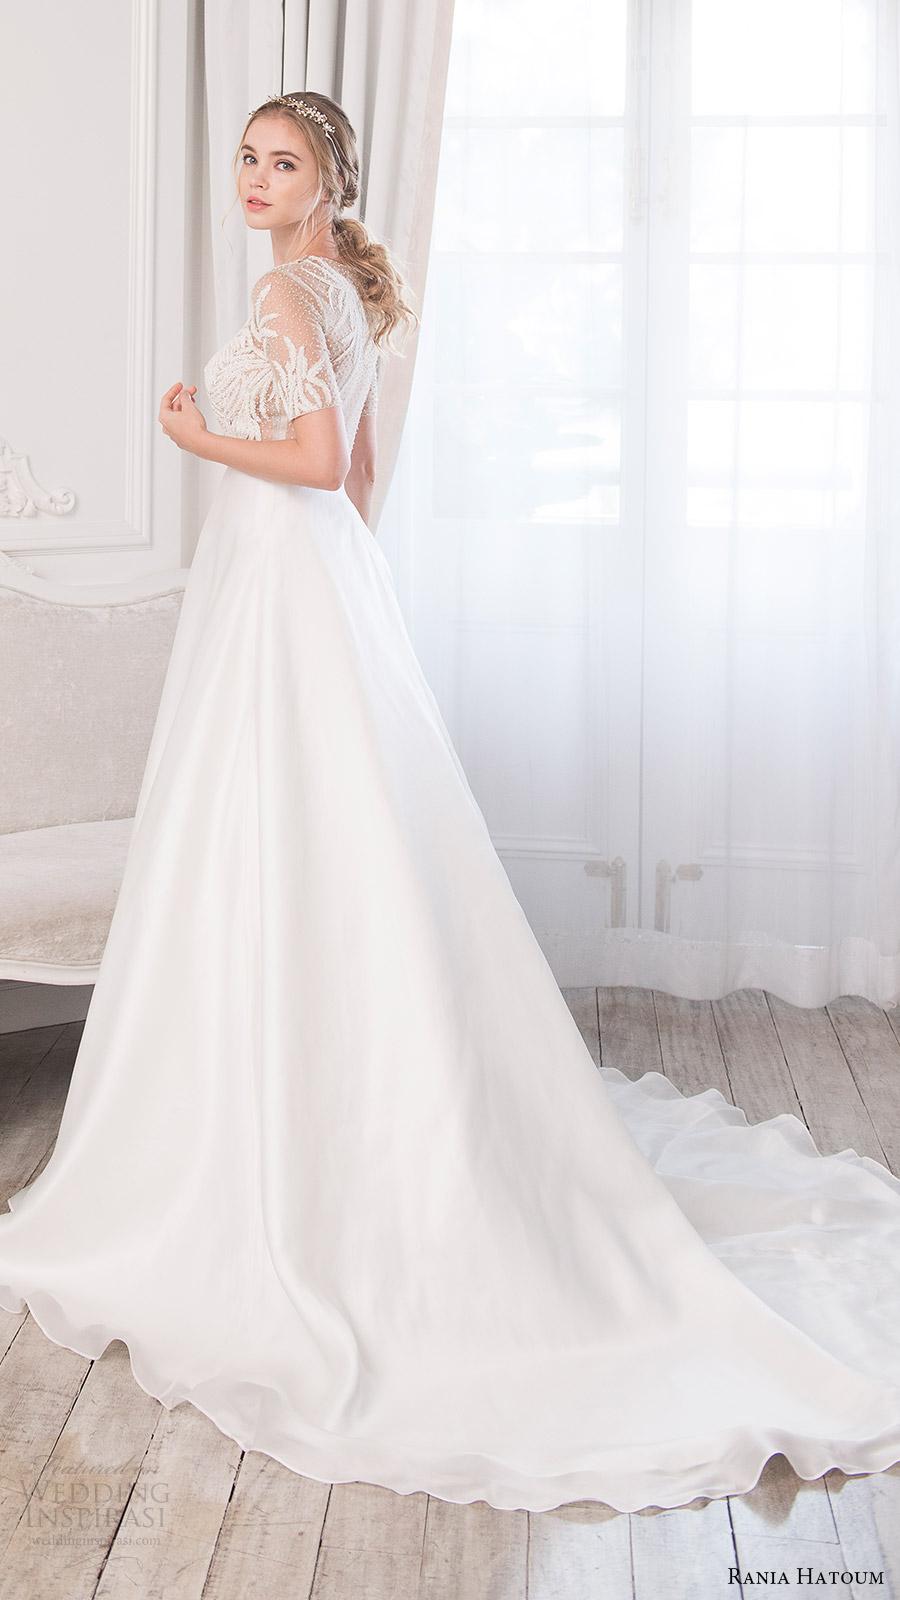 Short Ball Gown Wedding Dresses 6 Fancy rania hatoum bridal spring